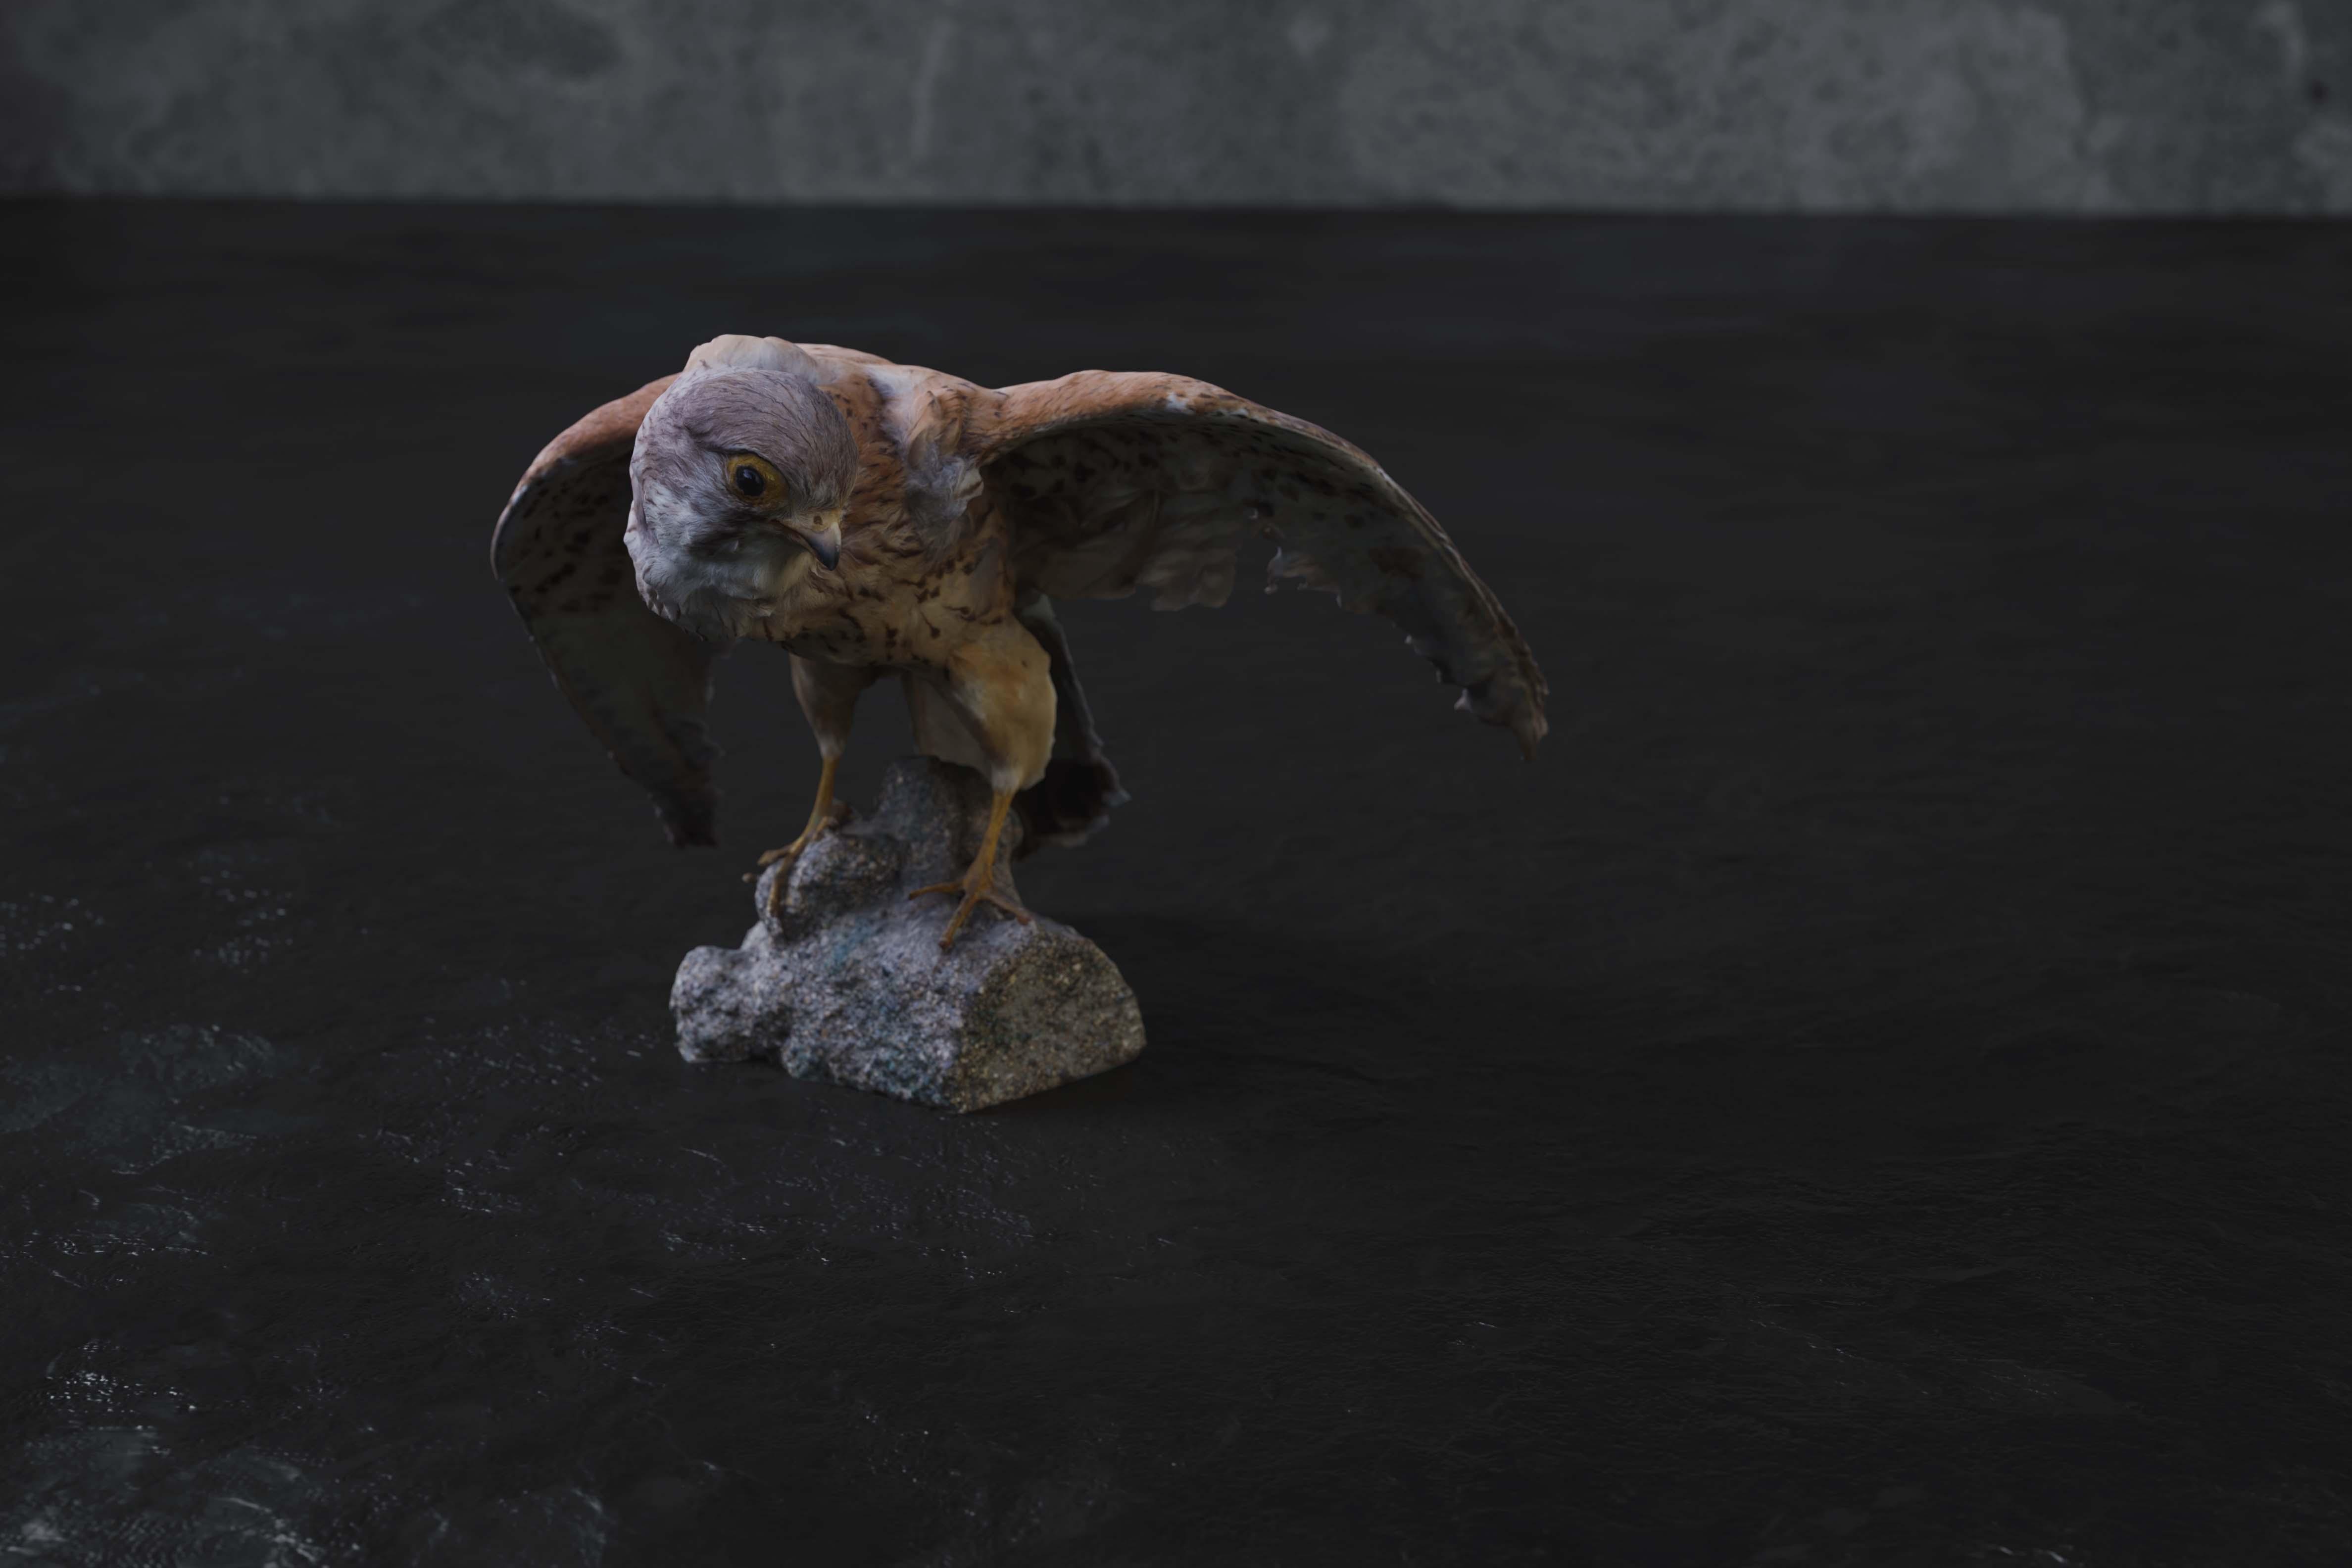 Realistic Kestrel Bird - 1